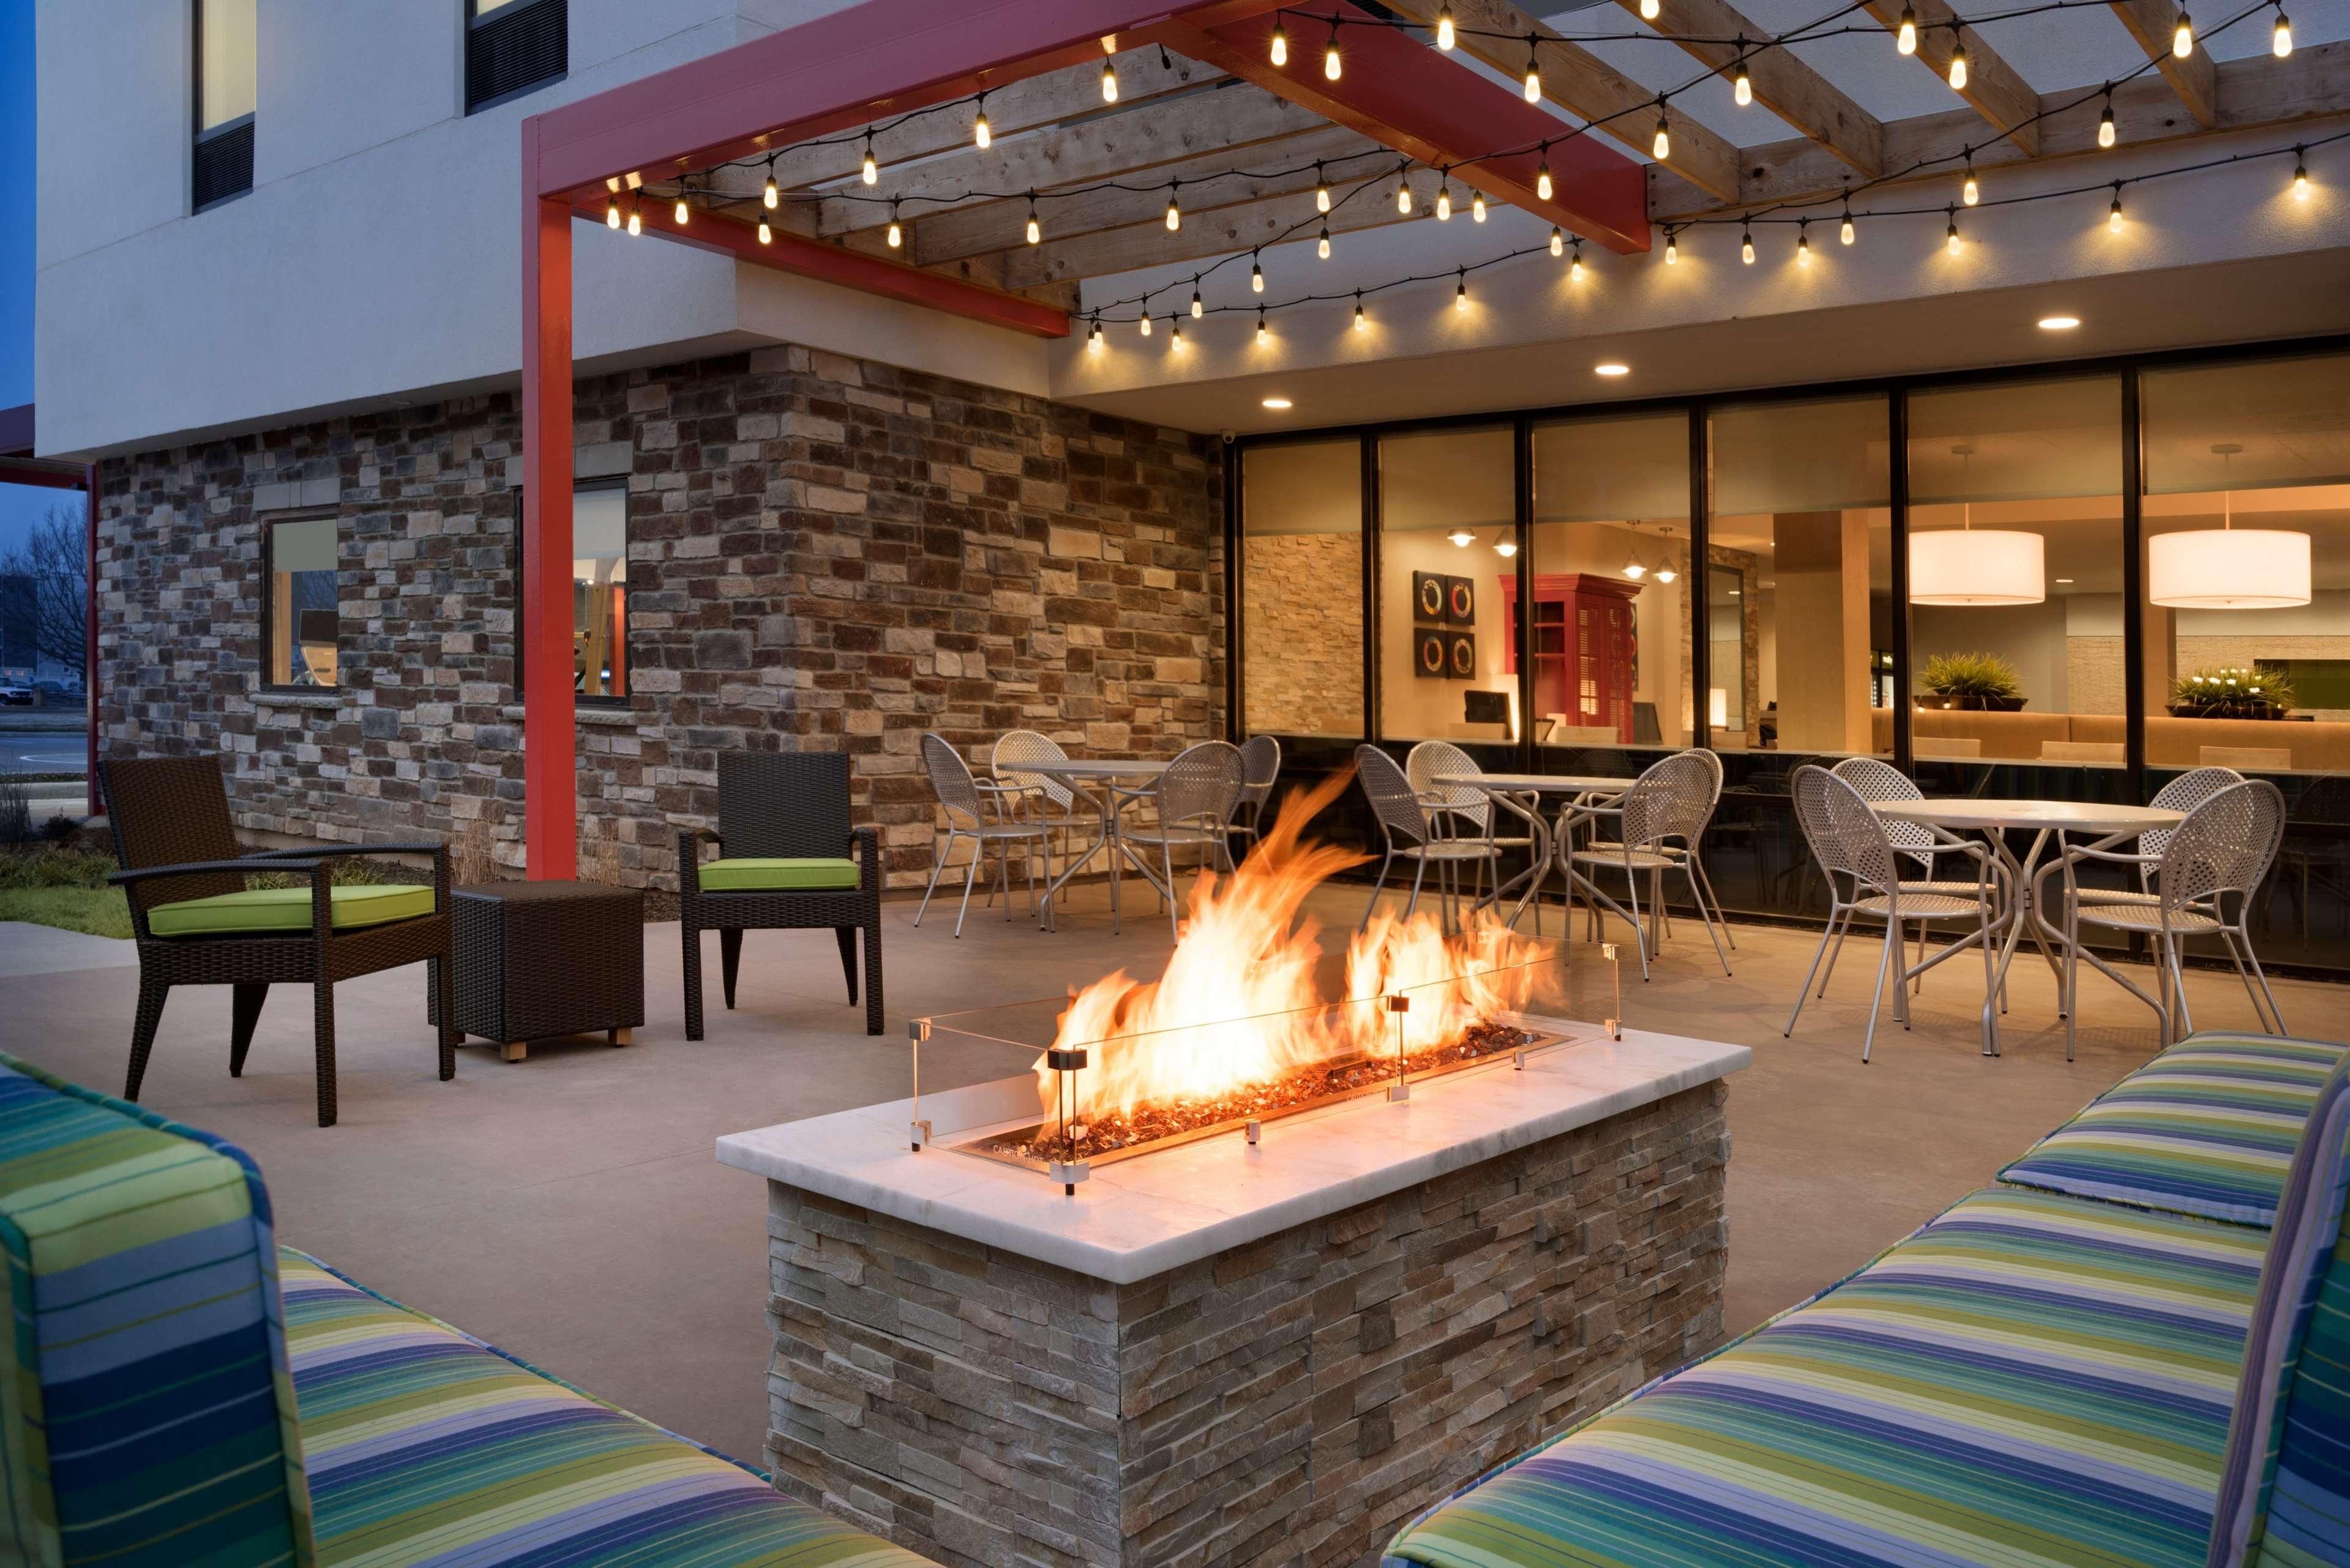 Home2 Suites by Hilton Leavenworth Downtown image 1